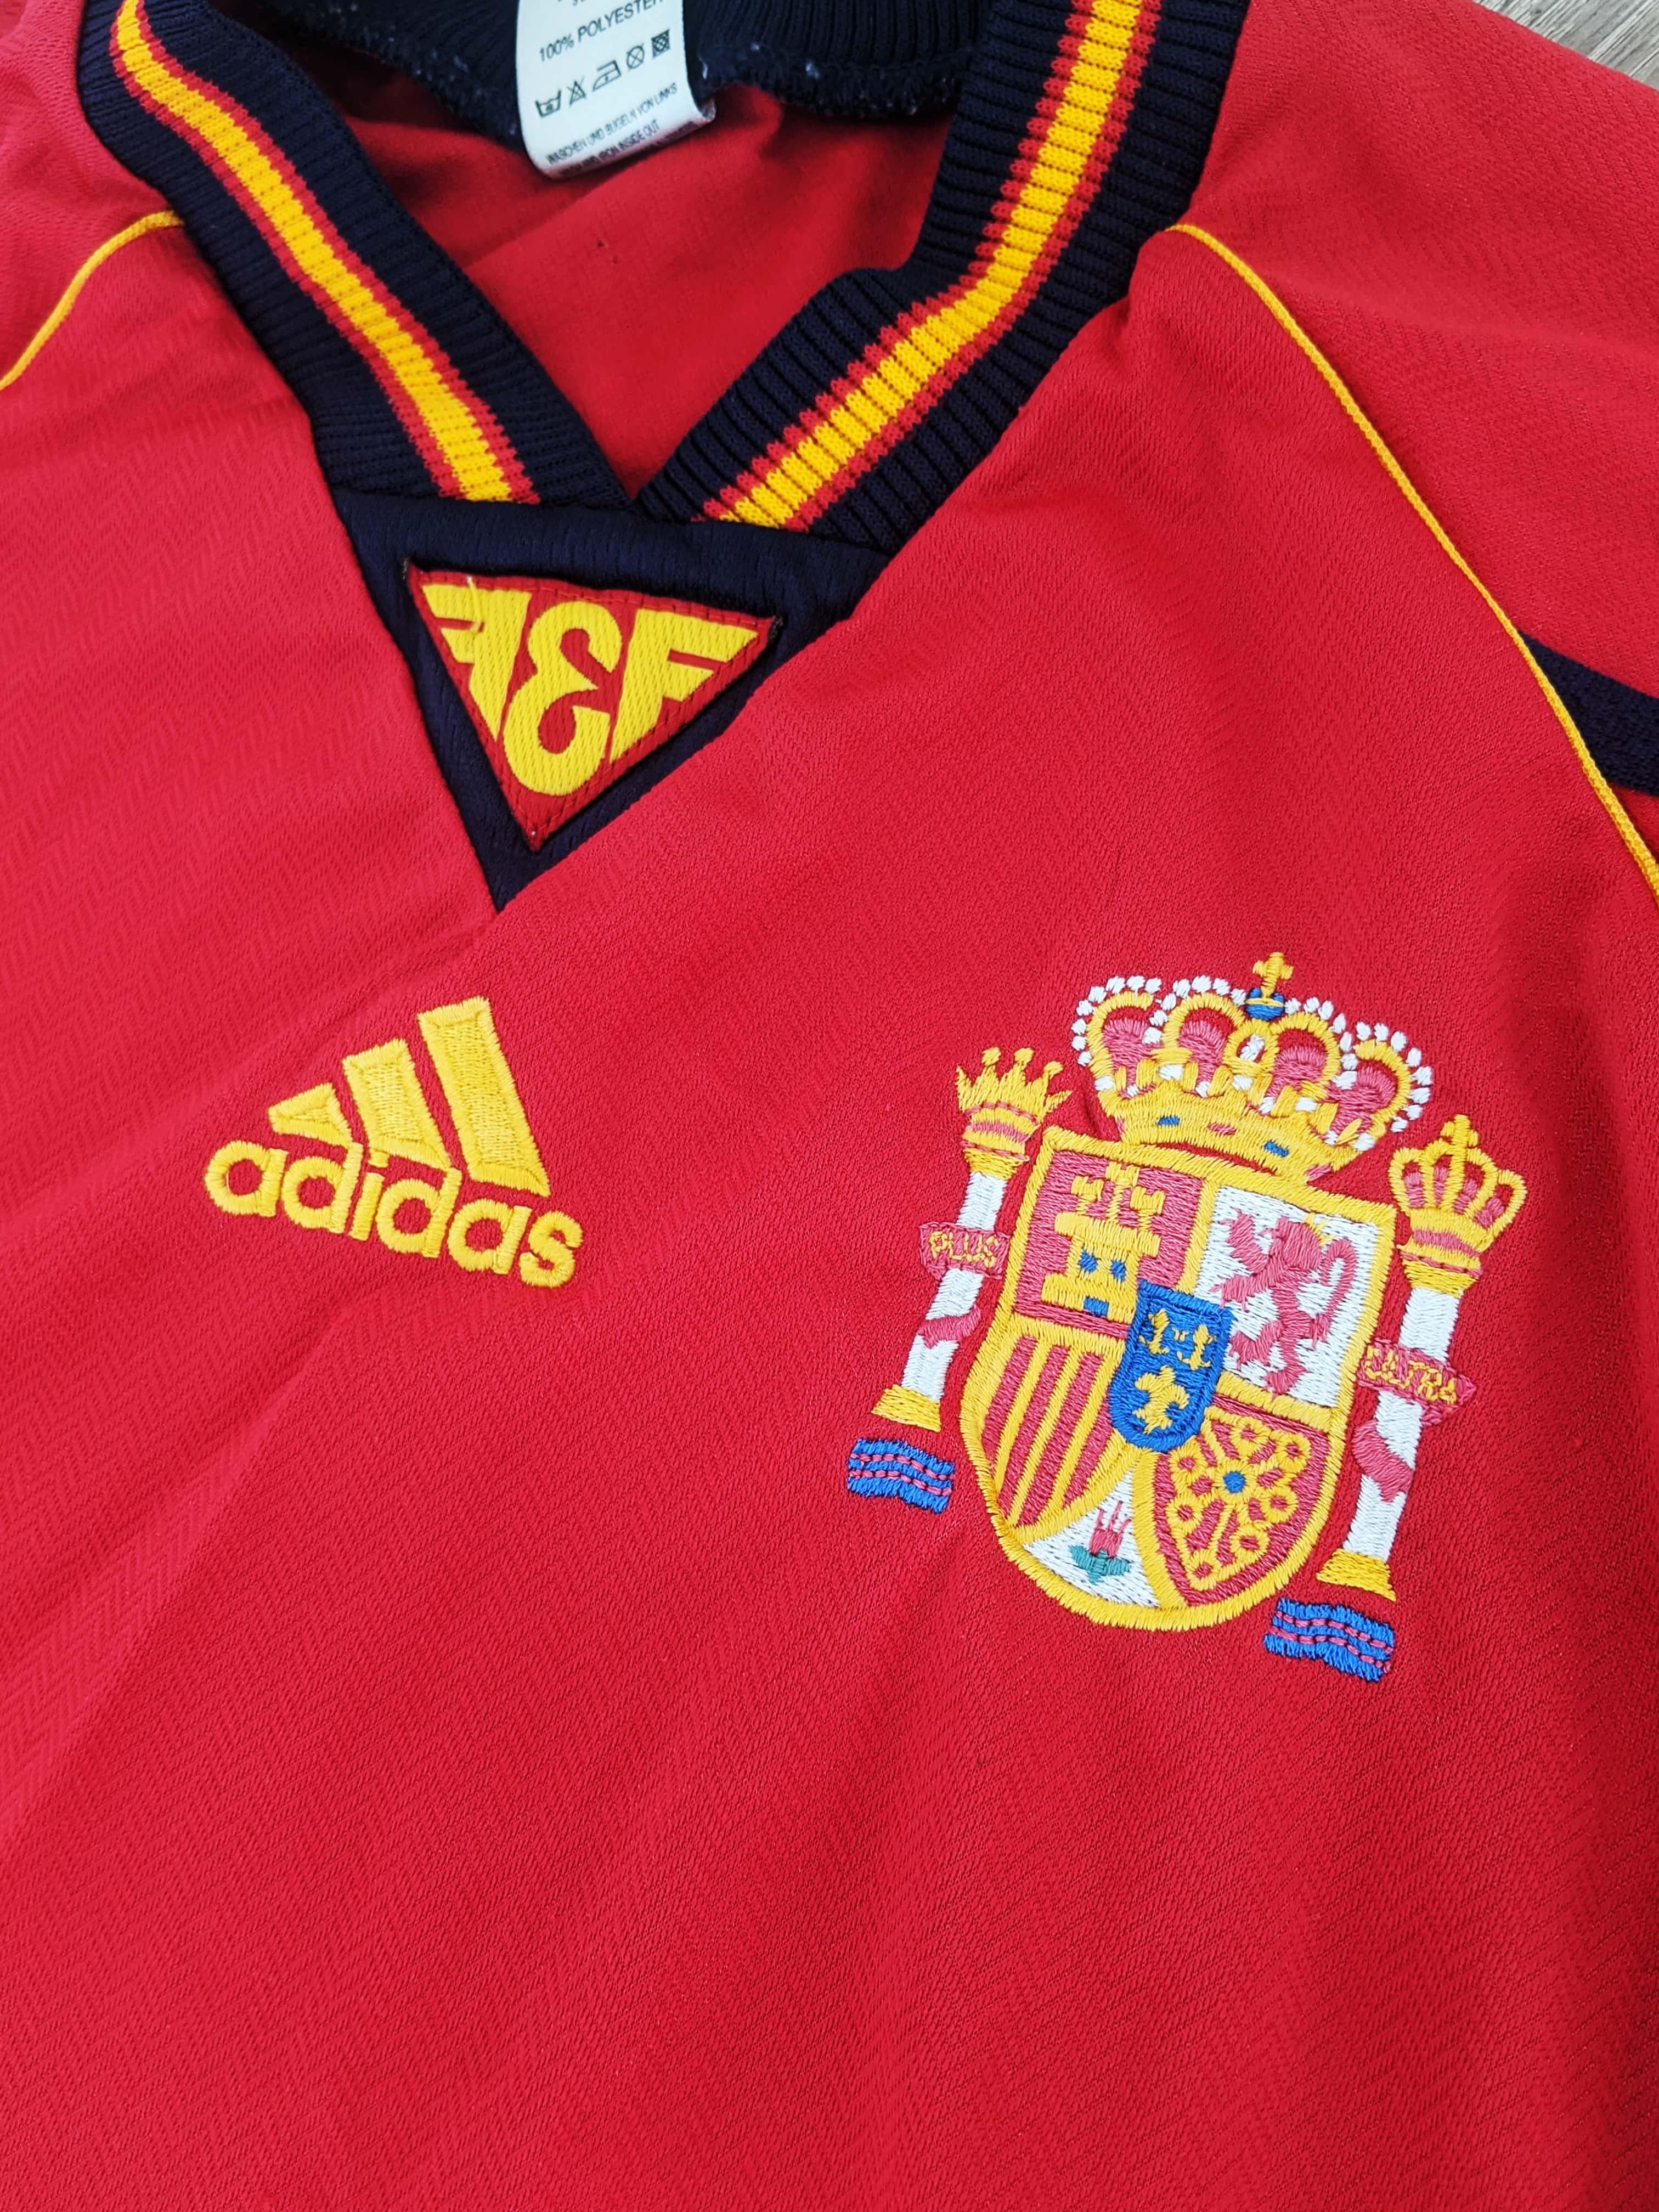 Spain home - 1998/99